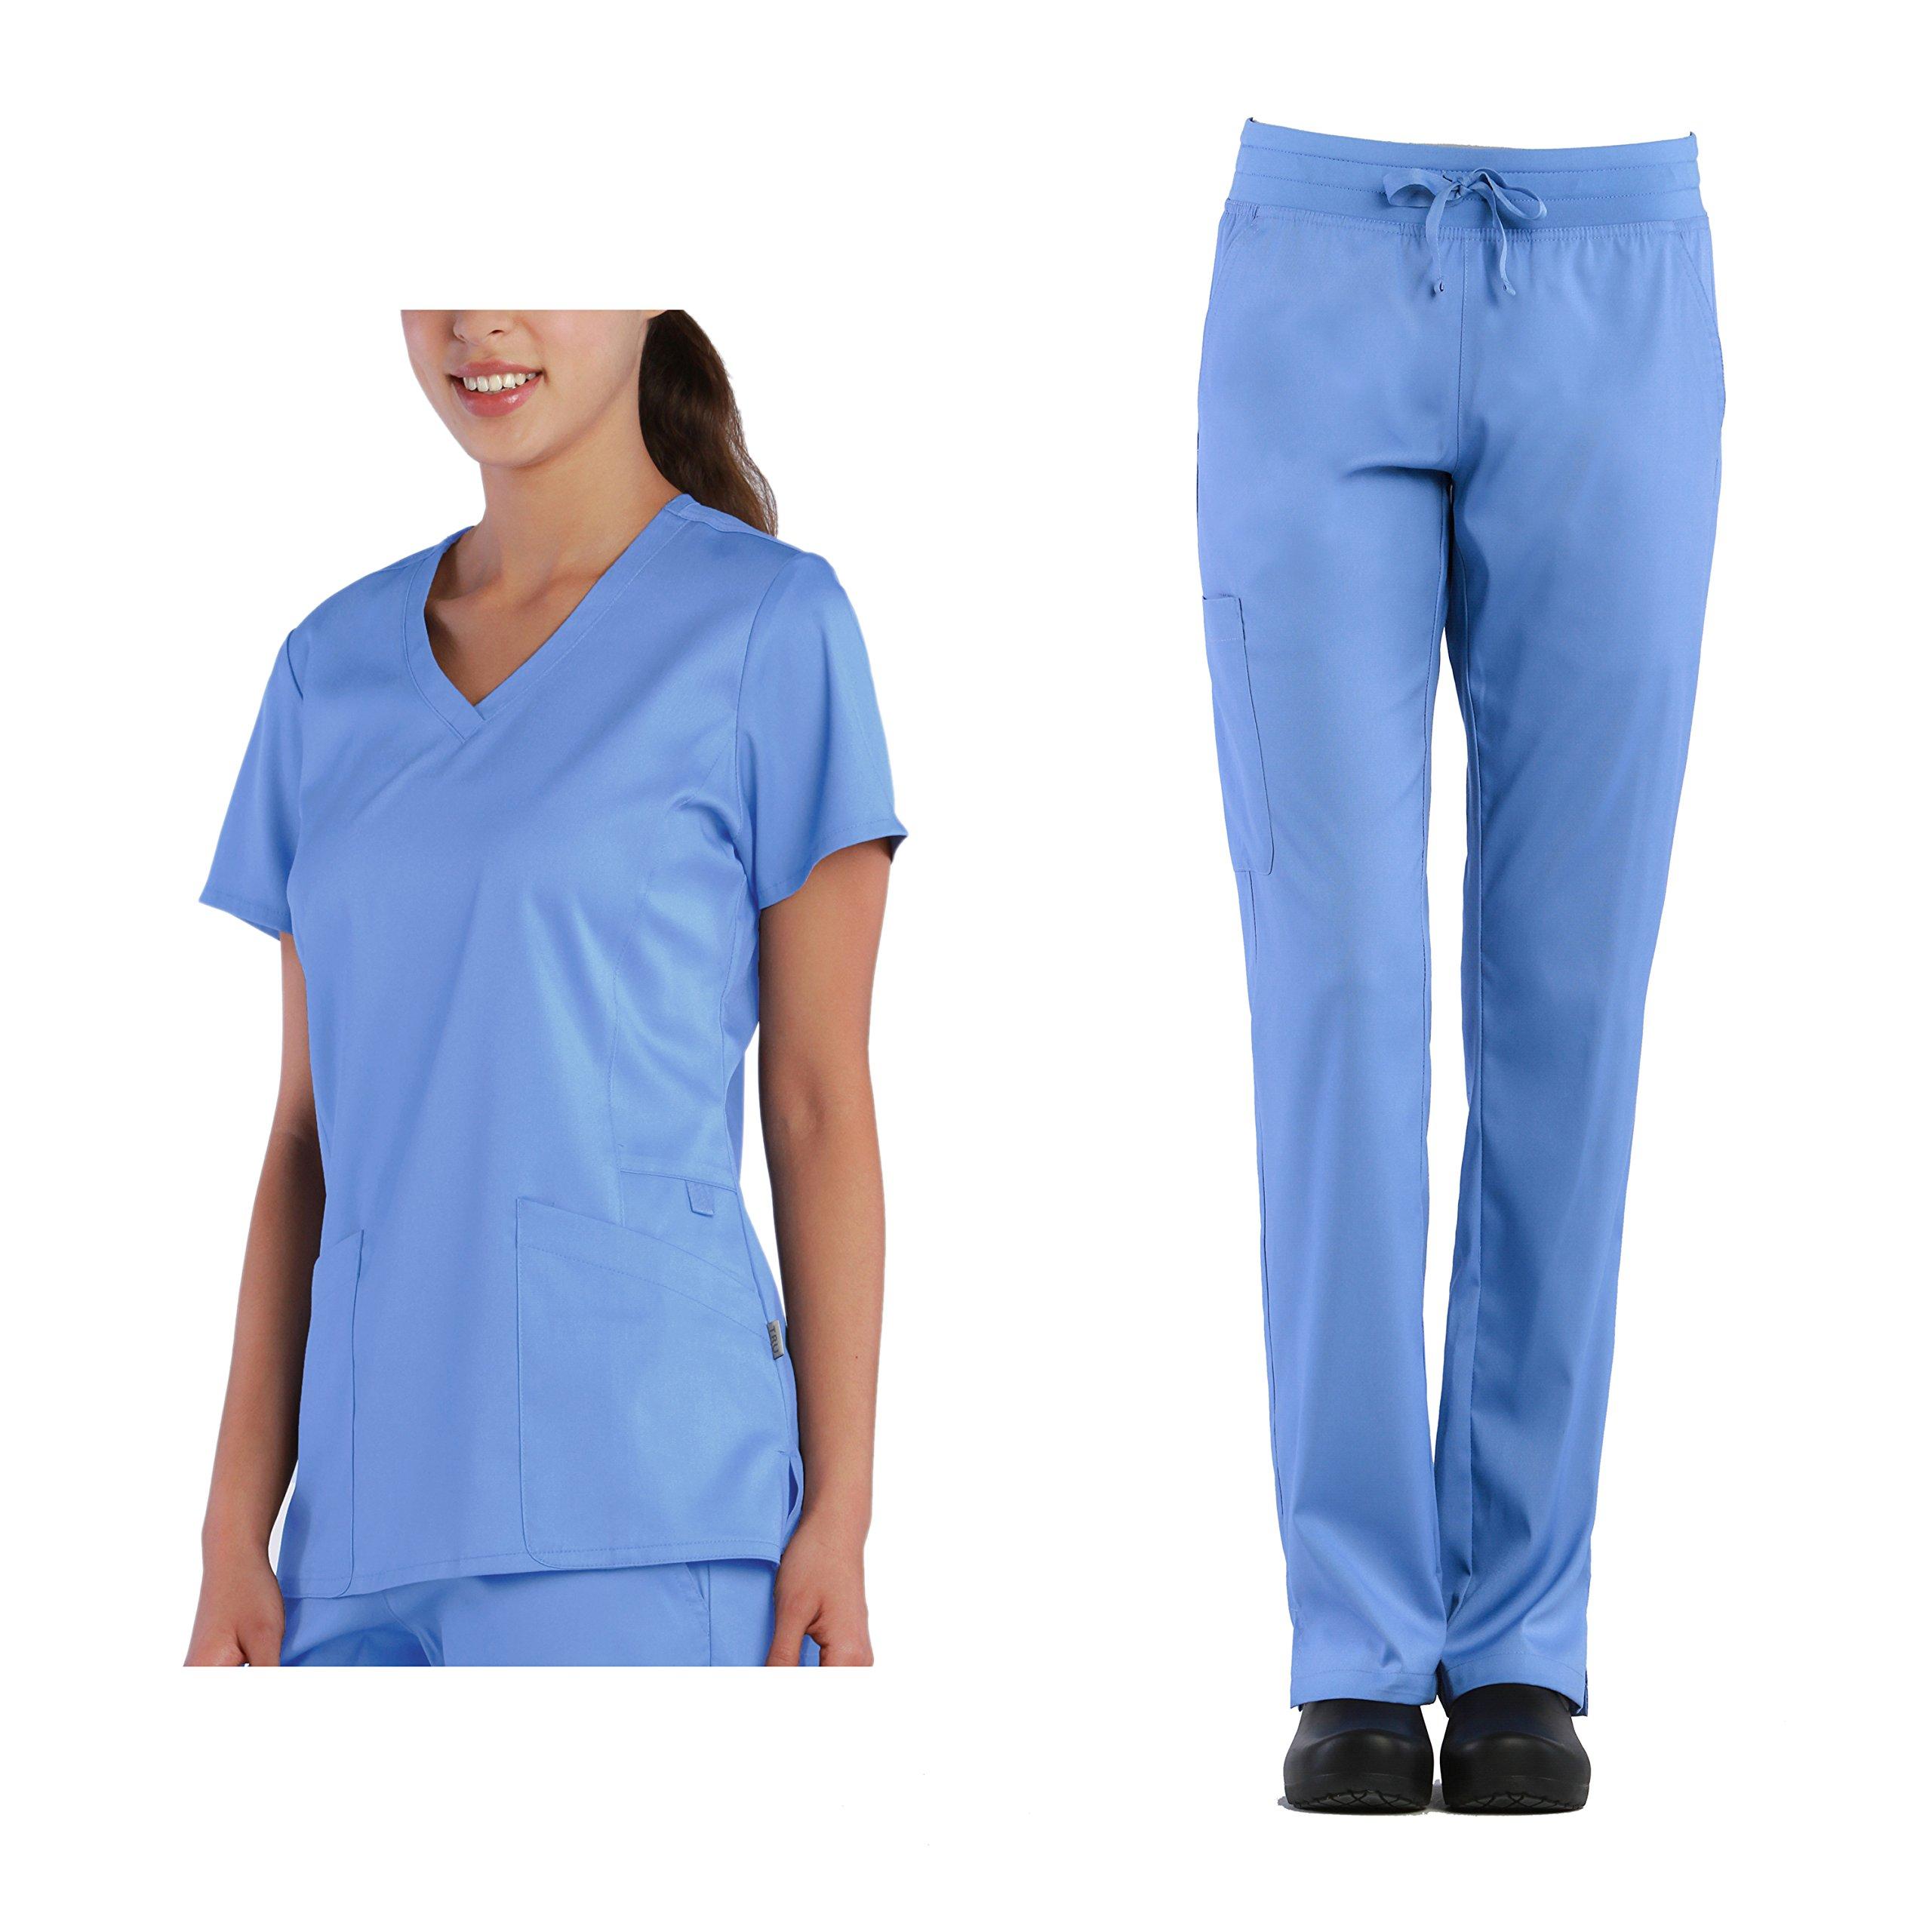 Tru Scrubs Soft Ladies Curved V-Neck Top & Yoga Style Cargo Pant Scrub Set (XXX-Large, Ceil Blue)